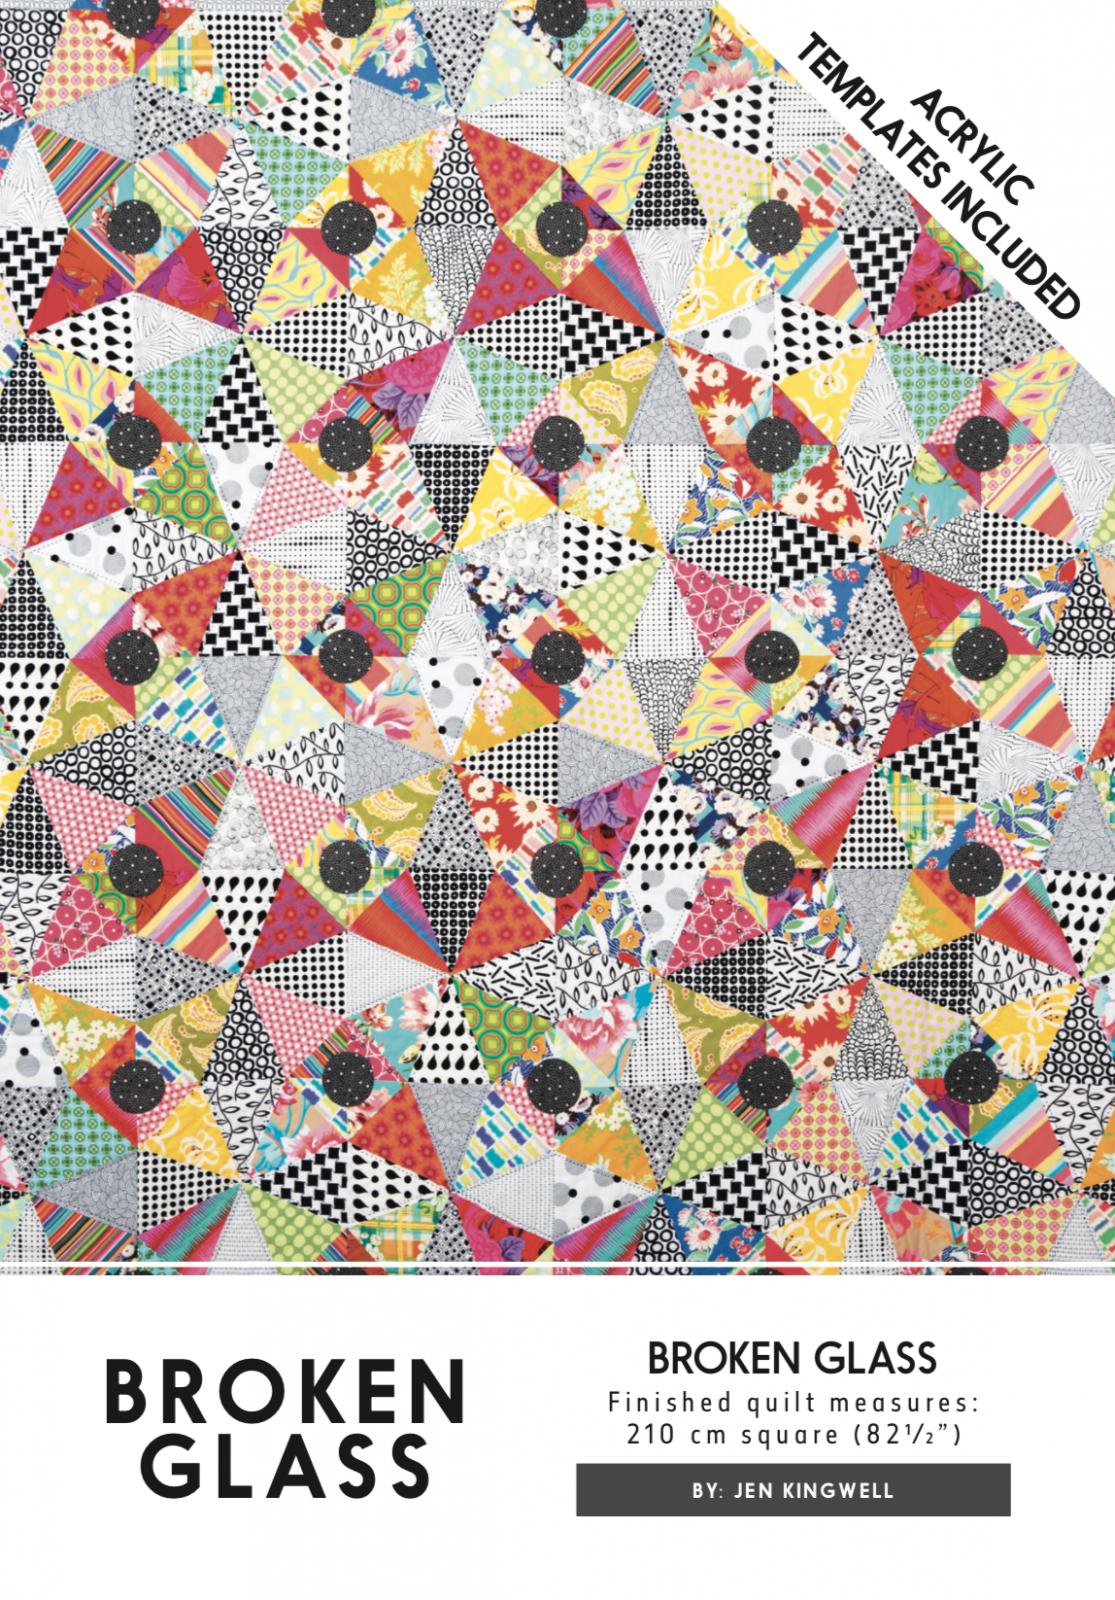 Broken Glass Pattern And Templates by Jen Kingwell